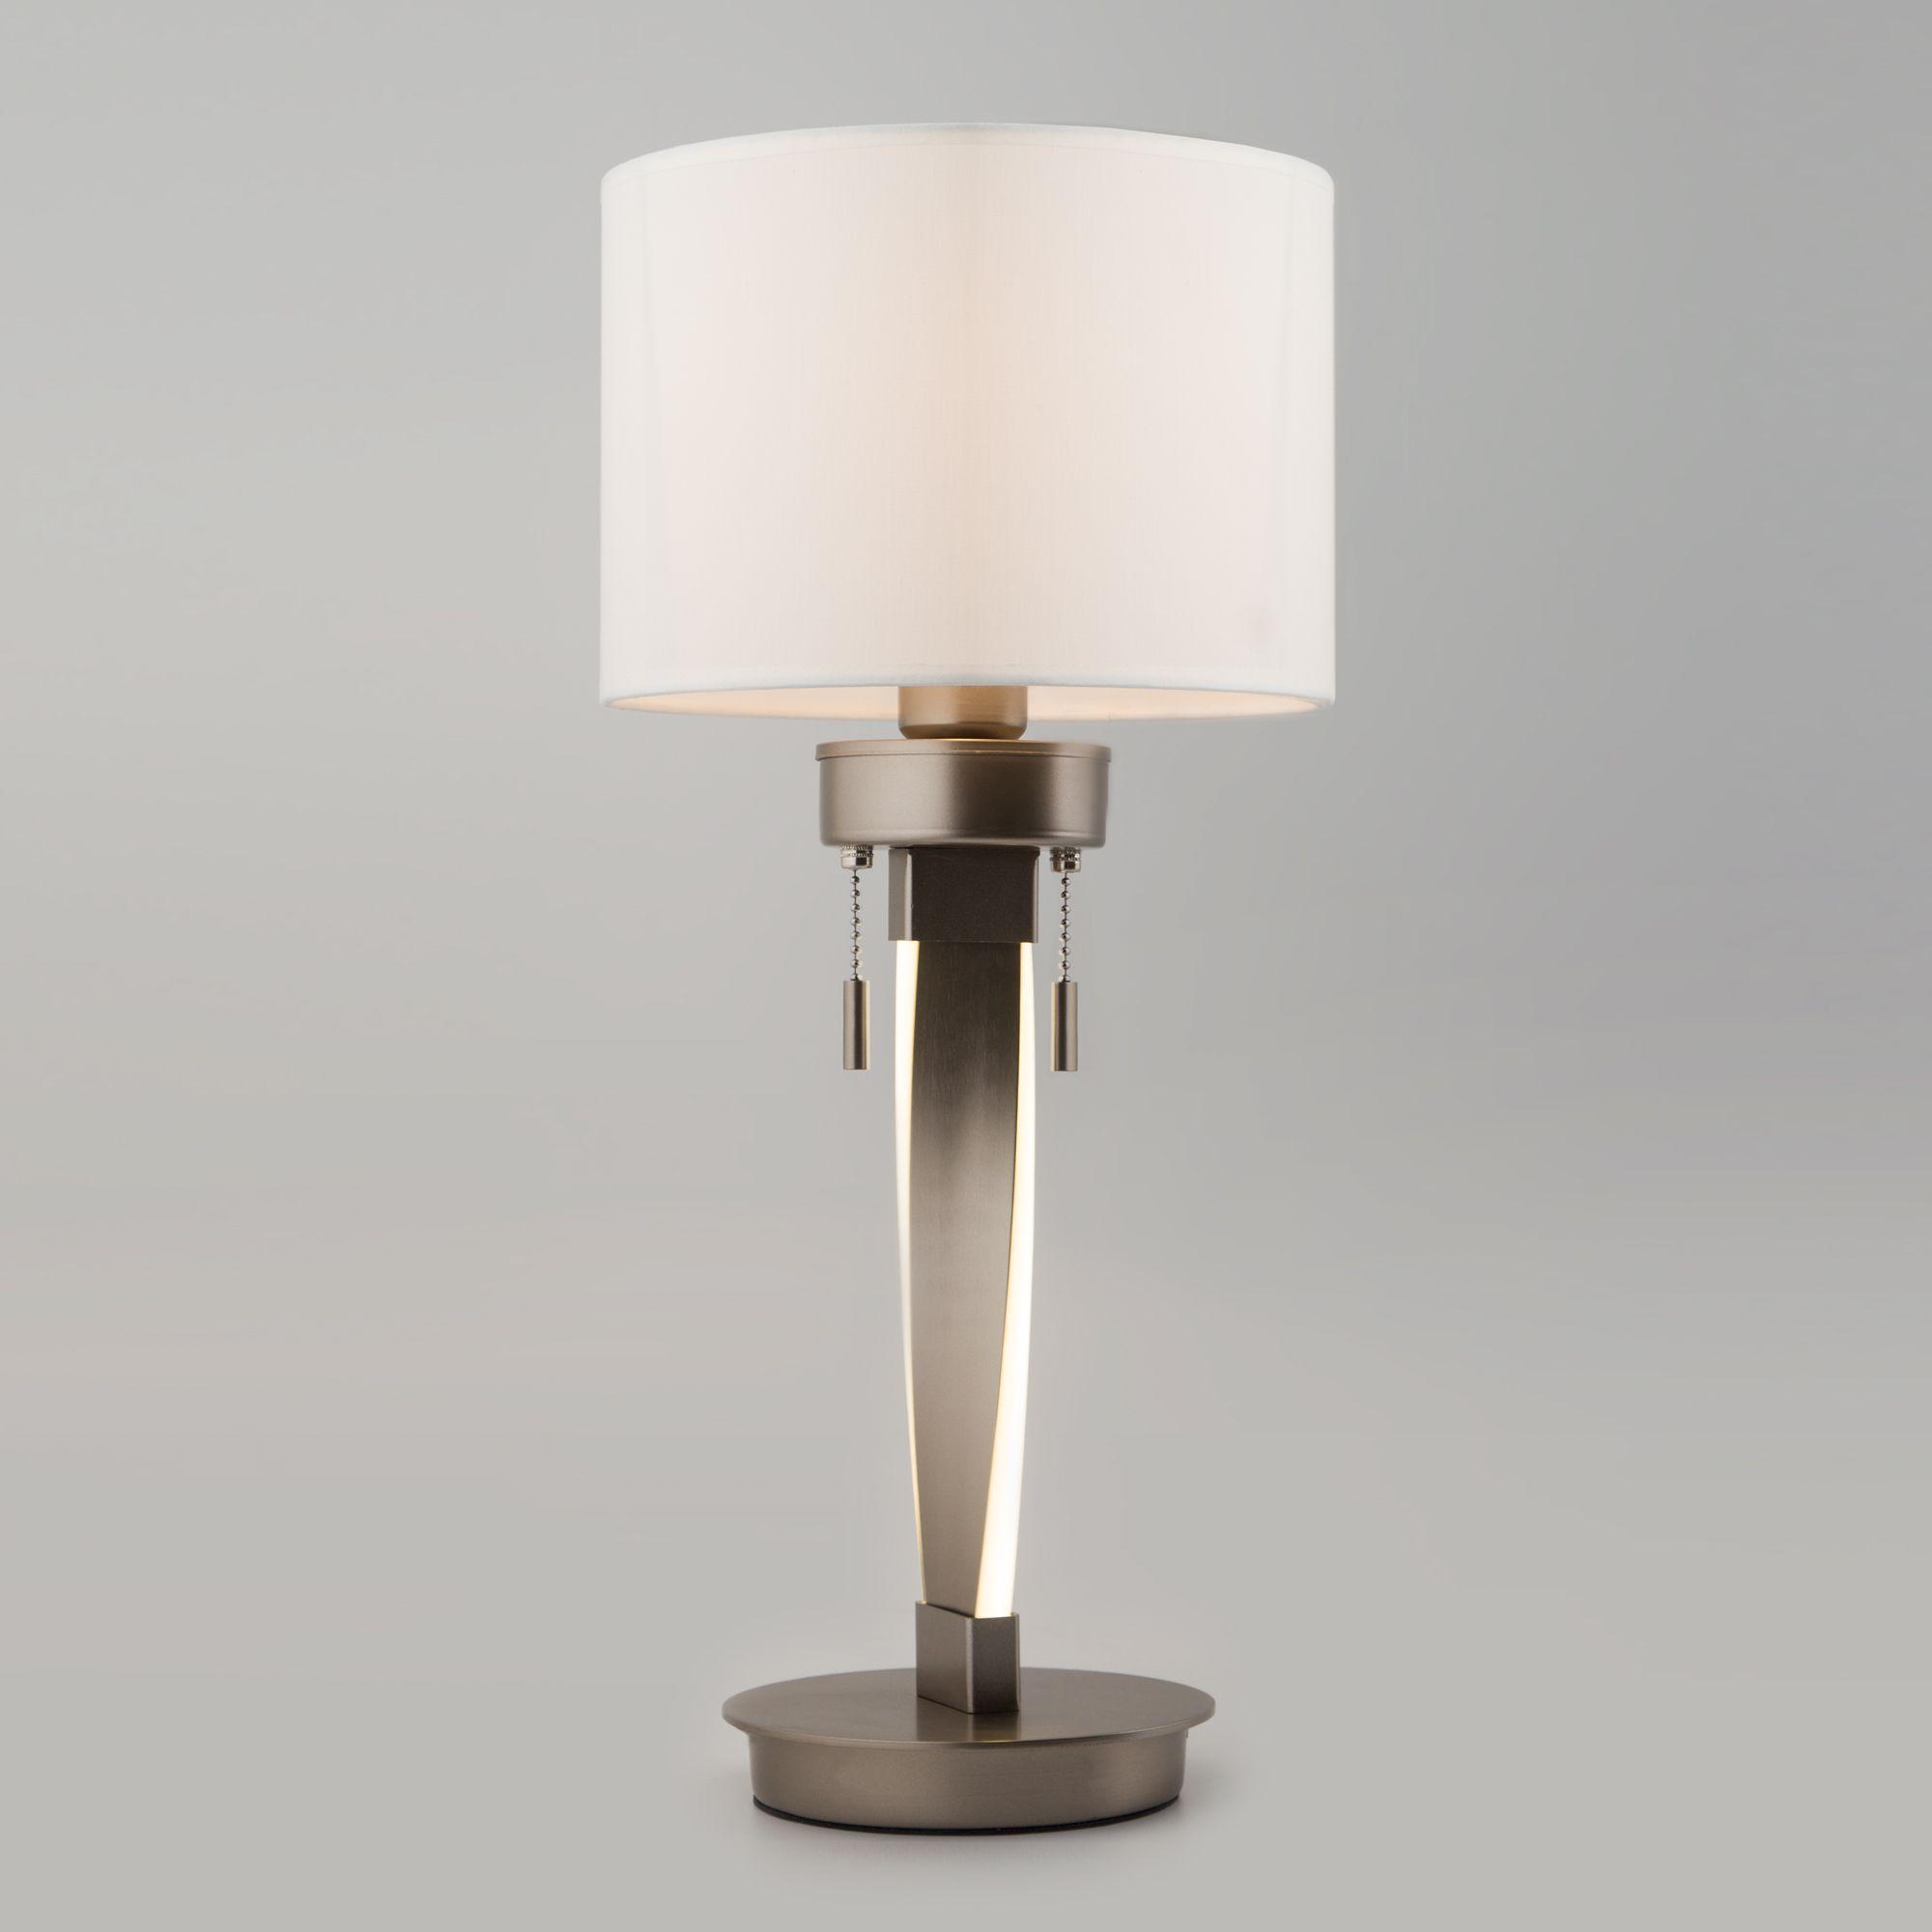 Настольная лампа со светодиодной подсветкой арматуры 993